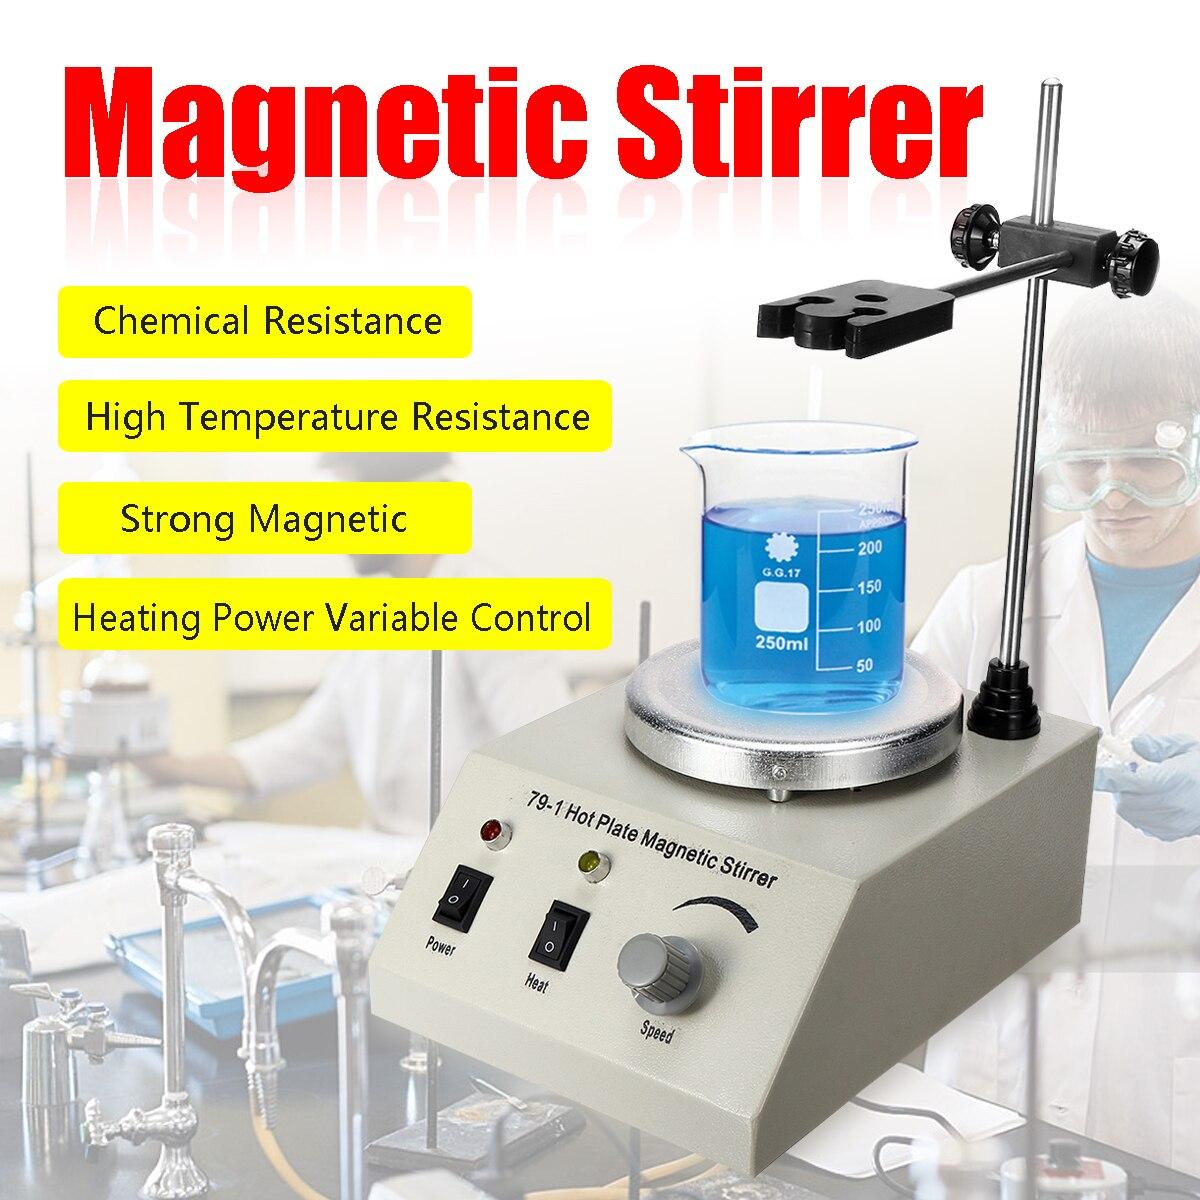 Lab heating speed control Mixer 79-1 1000 мл горячая пластина магнитная мешалка 220/В в без шума без вибрации США/EU/AU Plug Smooth Run